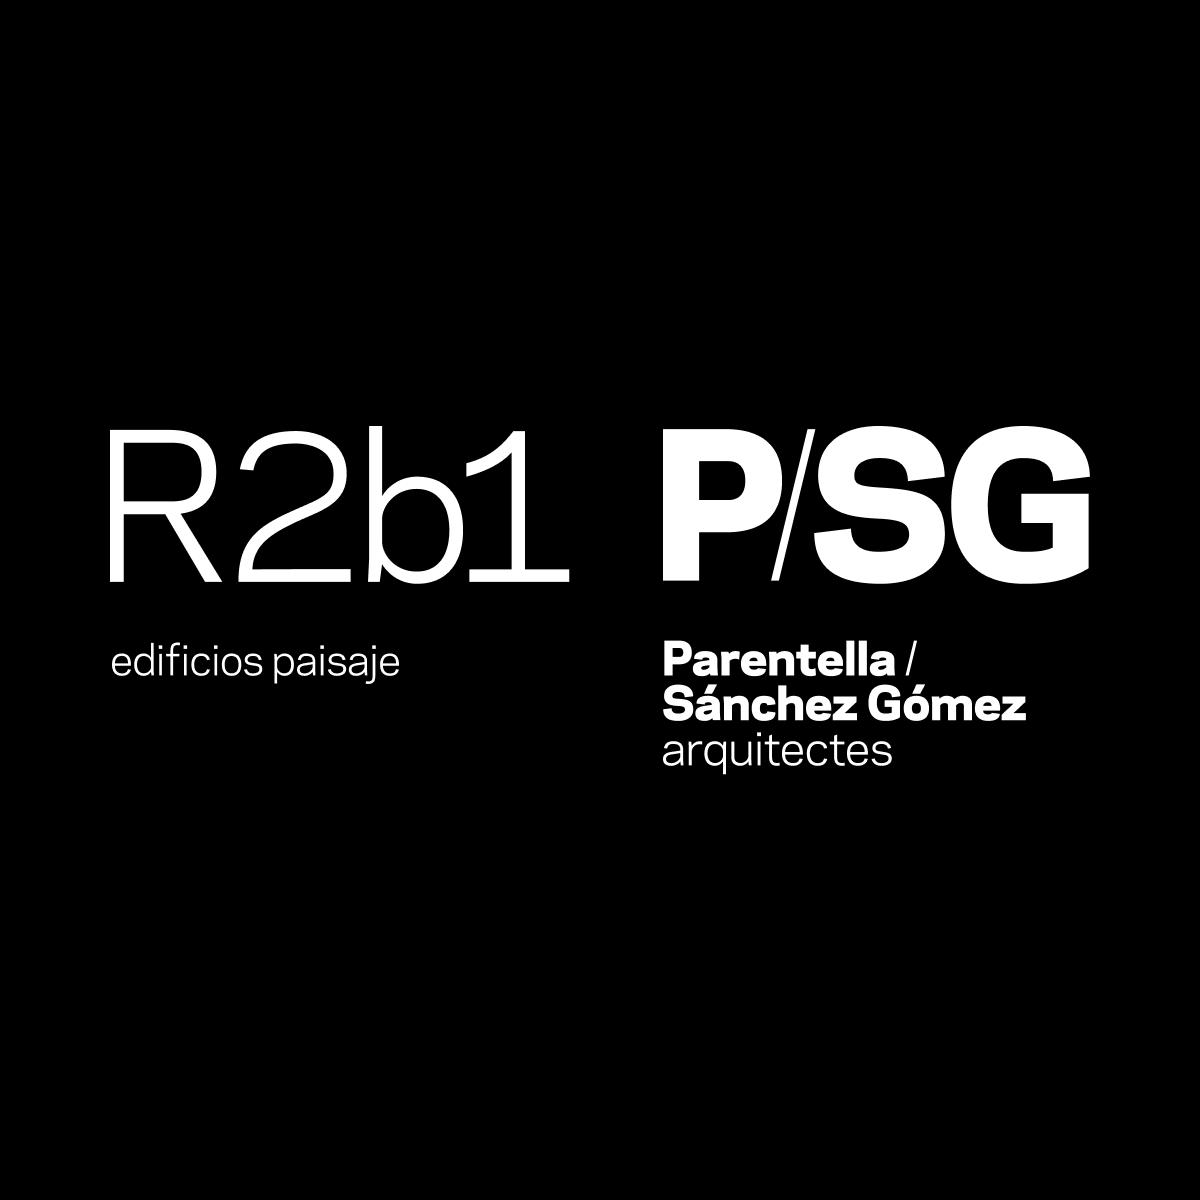 psgr2b1_post_negro